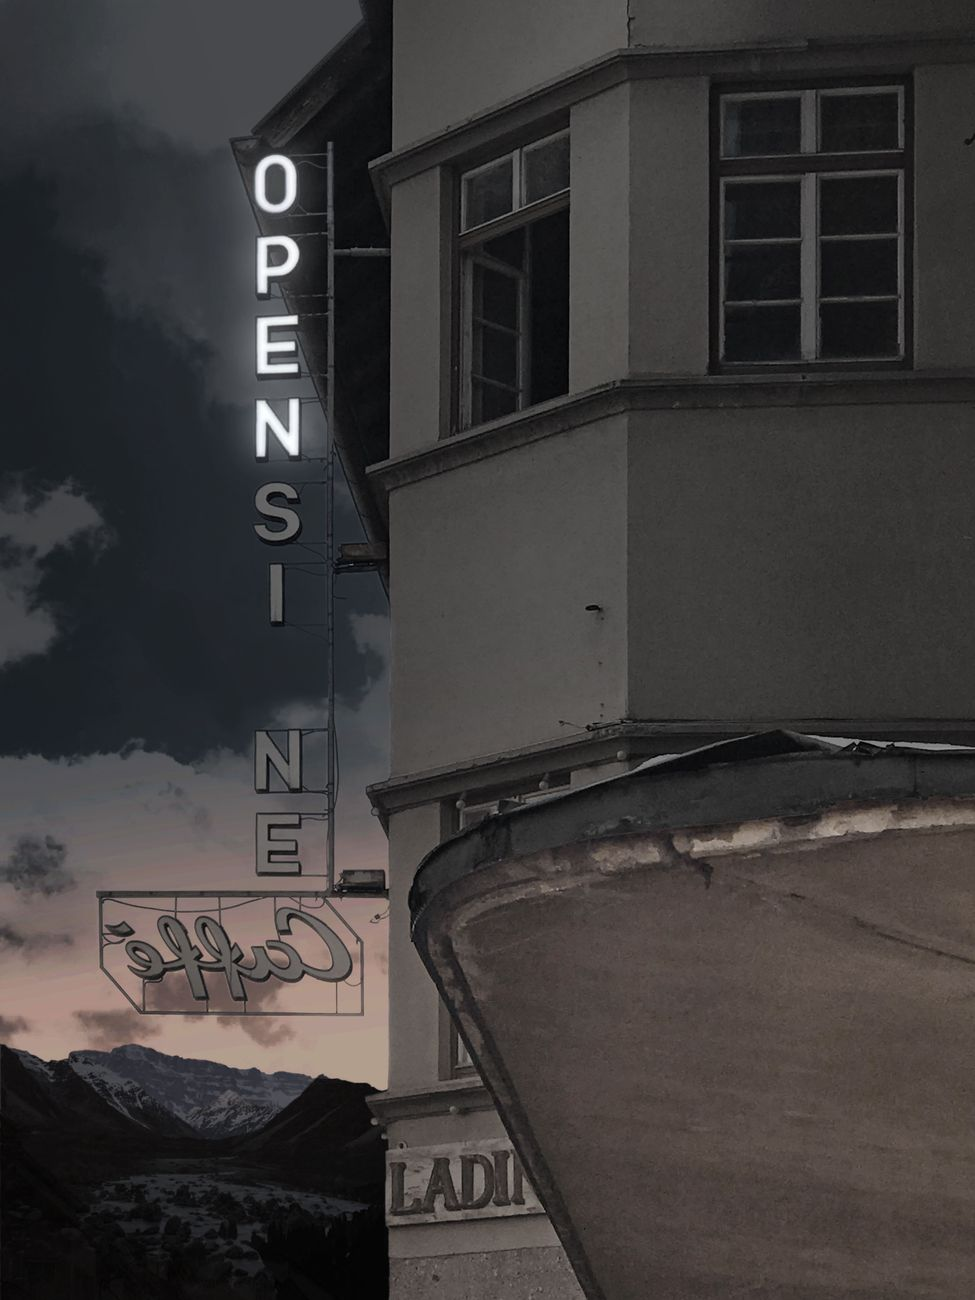 Pavel Büchler, OPEN (Rendering for Biennale Gherdëina 7), 2020